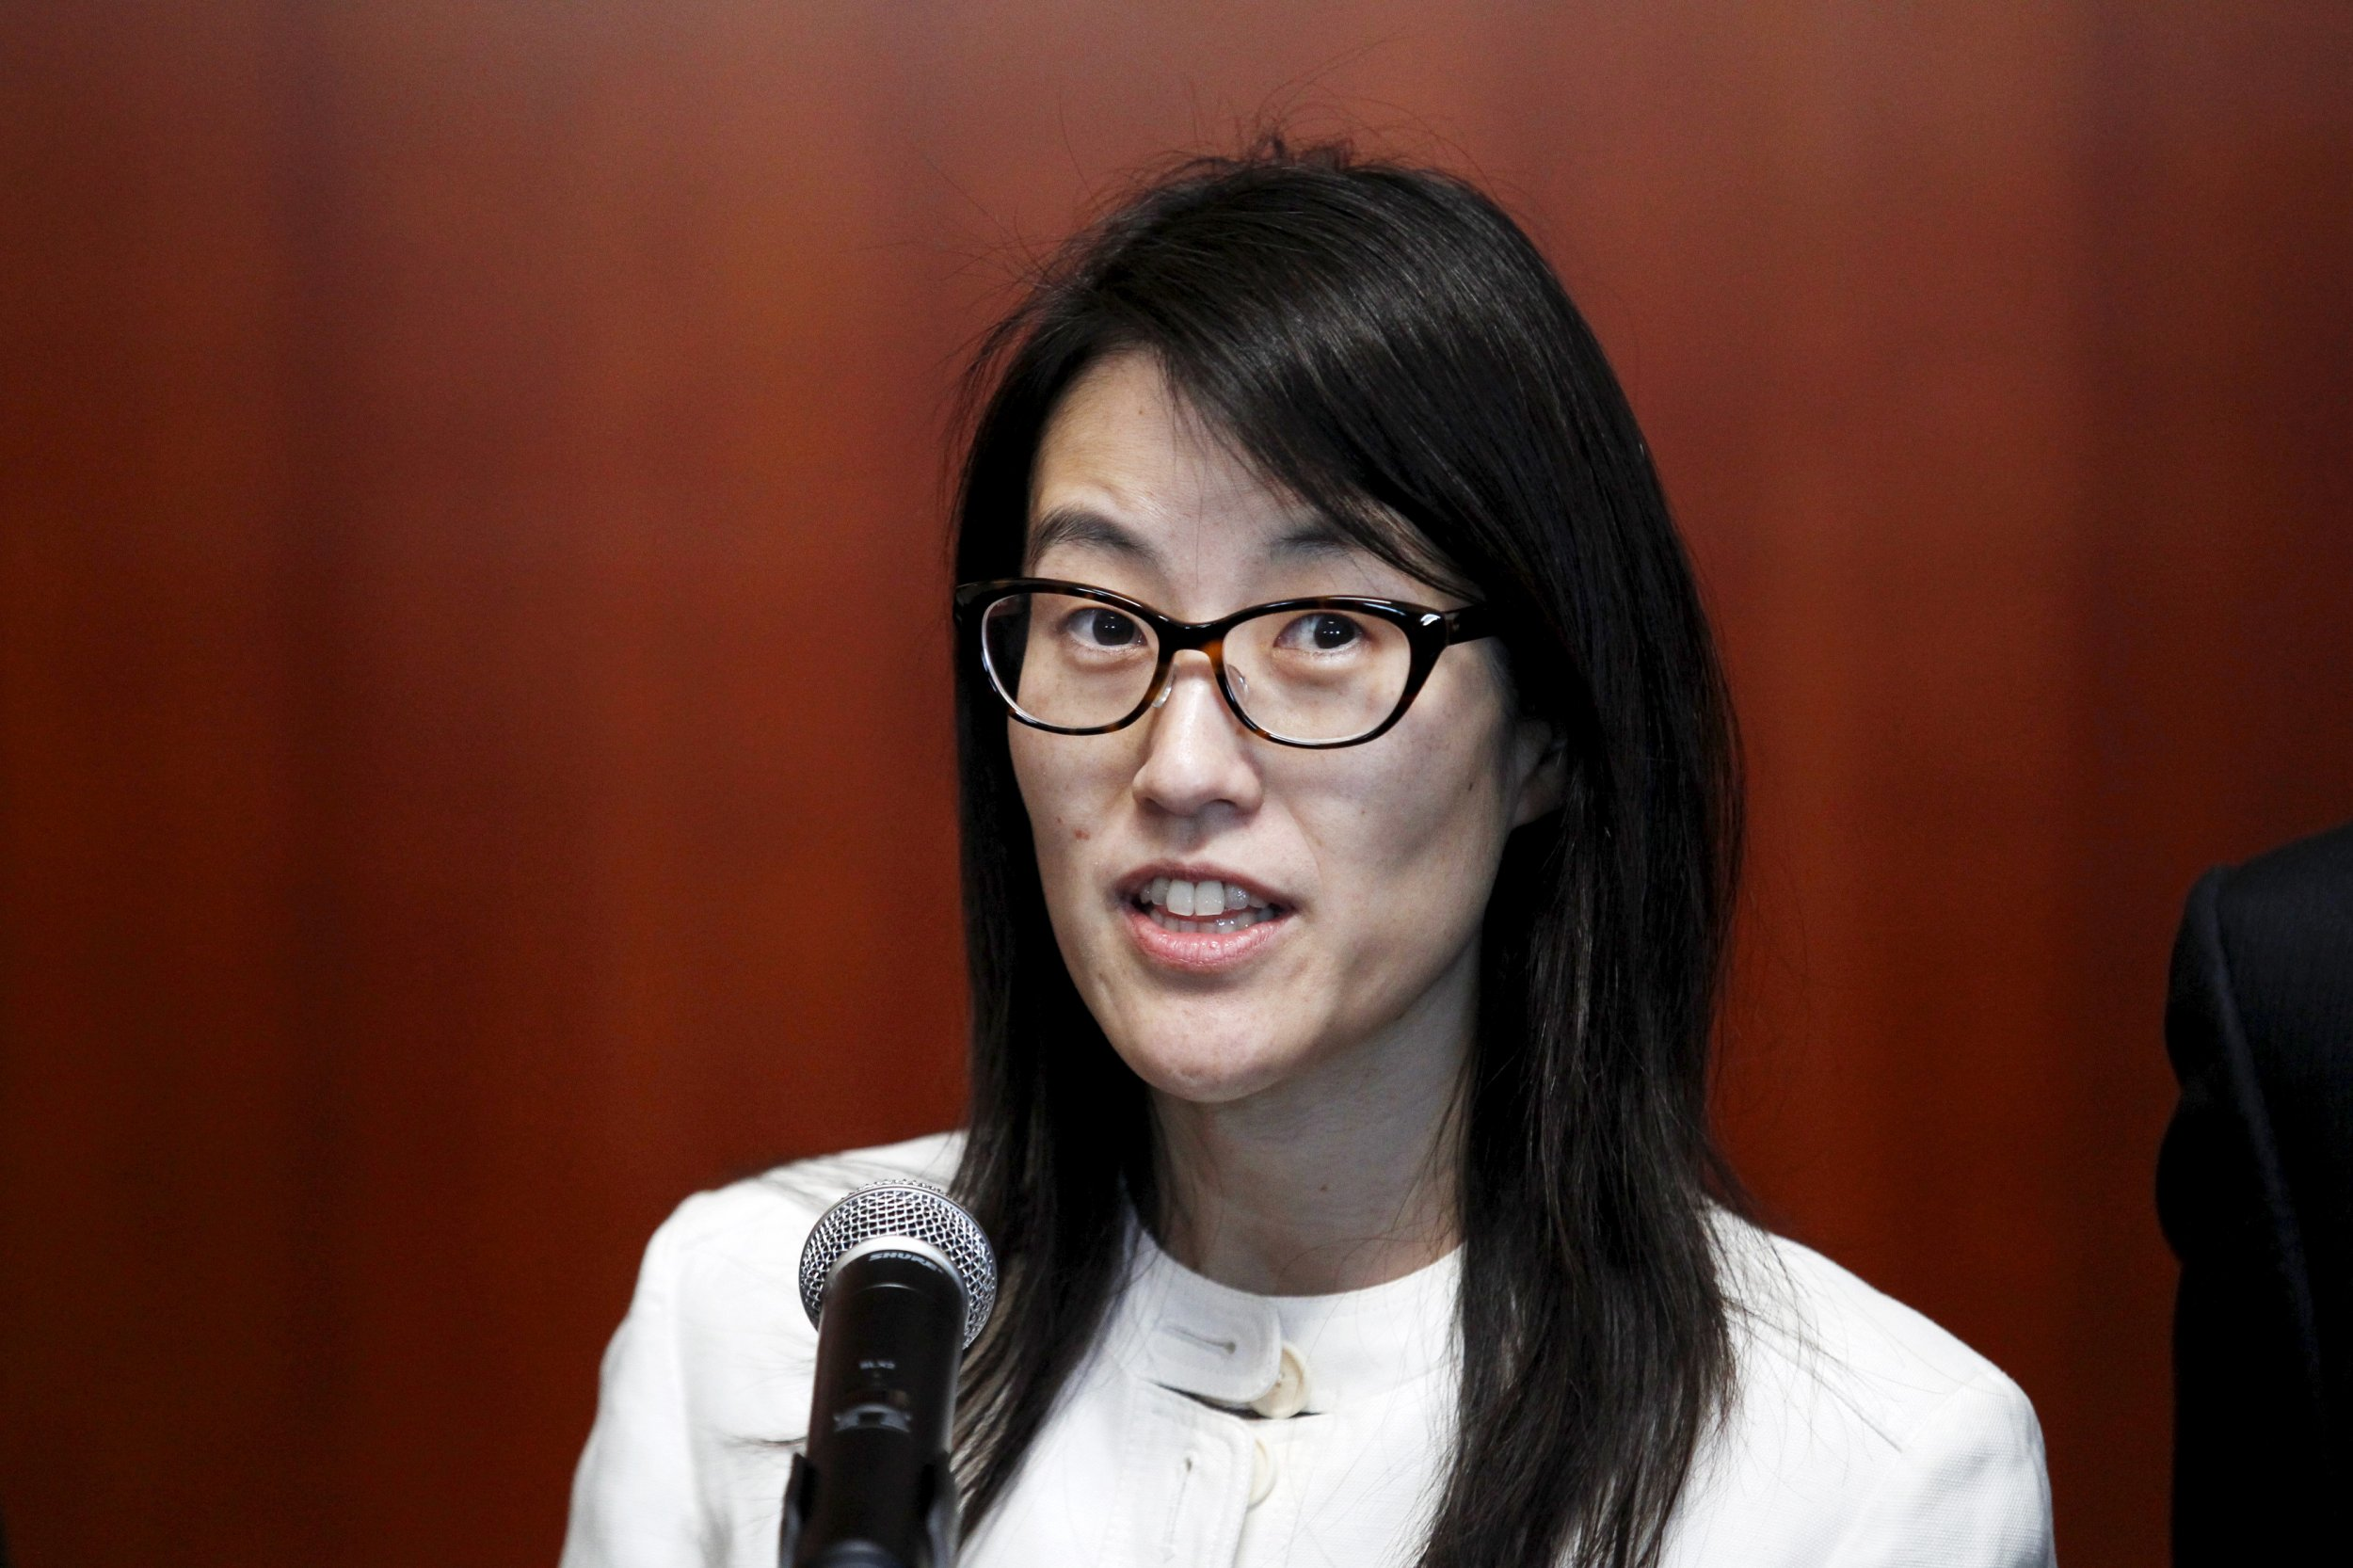 Interim Reddit CEO Ellen Pao upset users when a popular employee was fired.